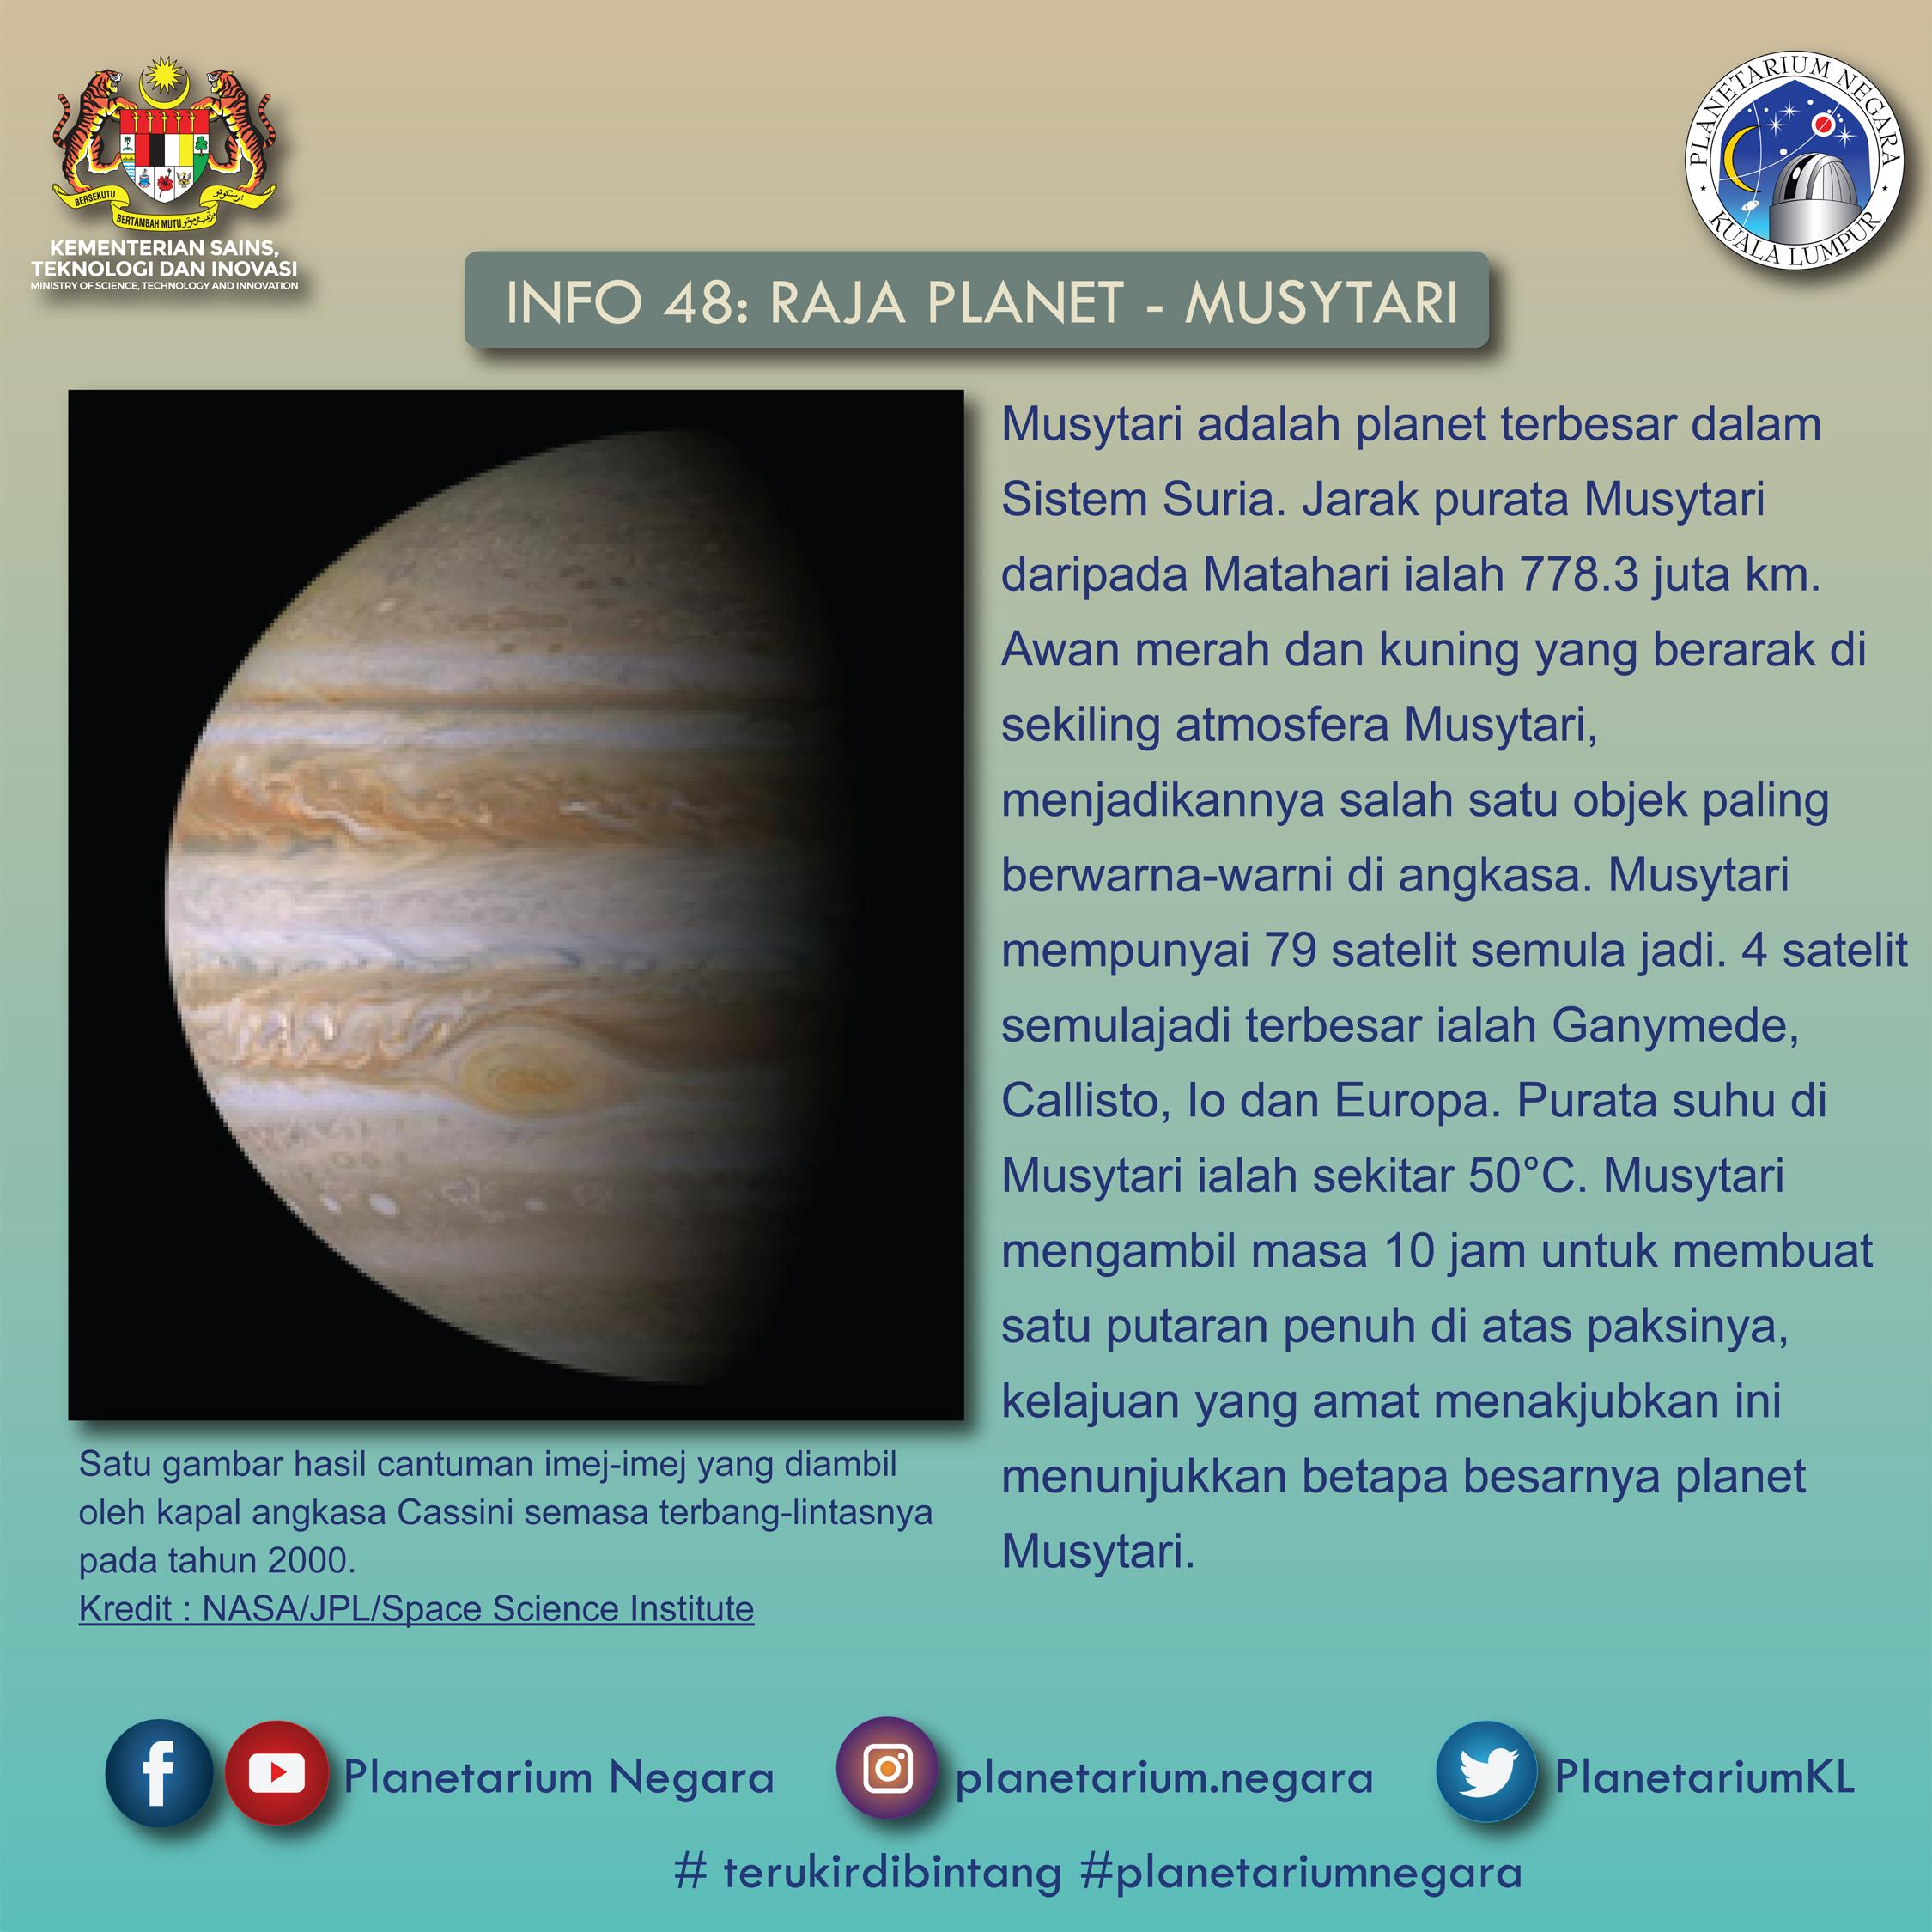 PlanetariumNegara on Twitter